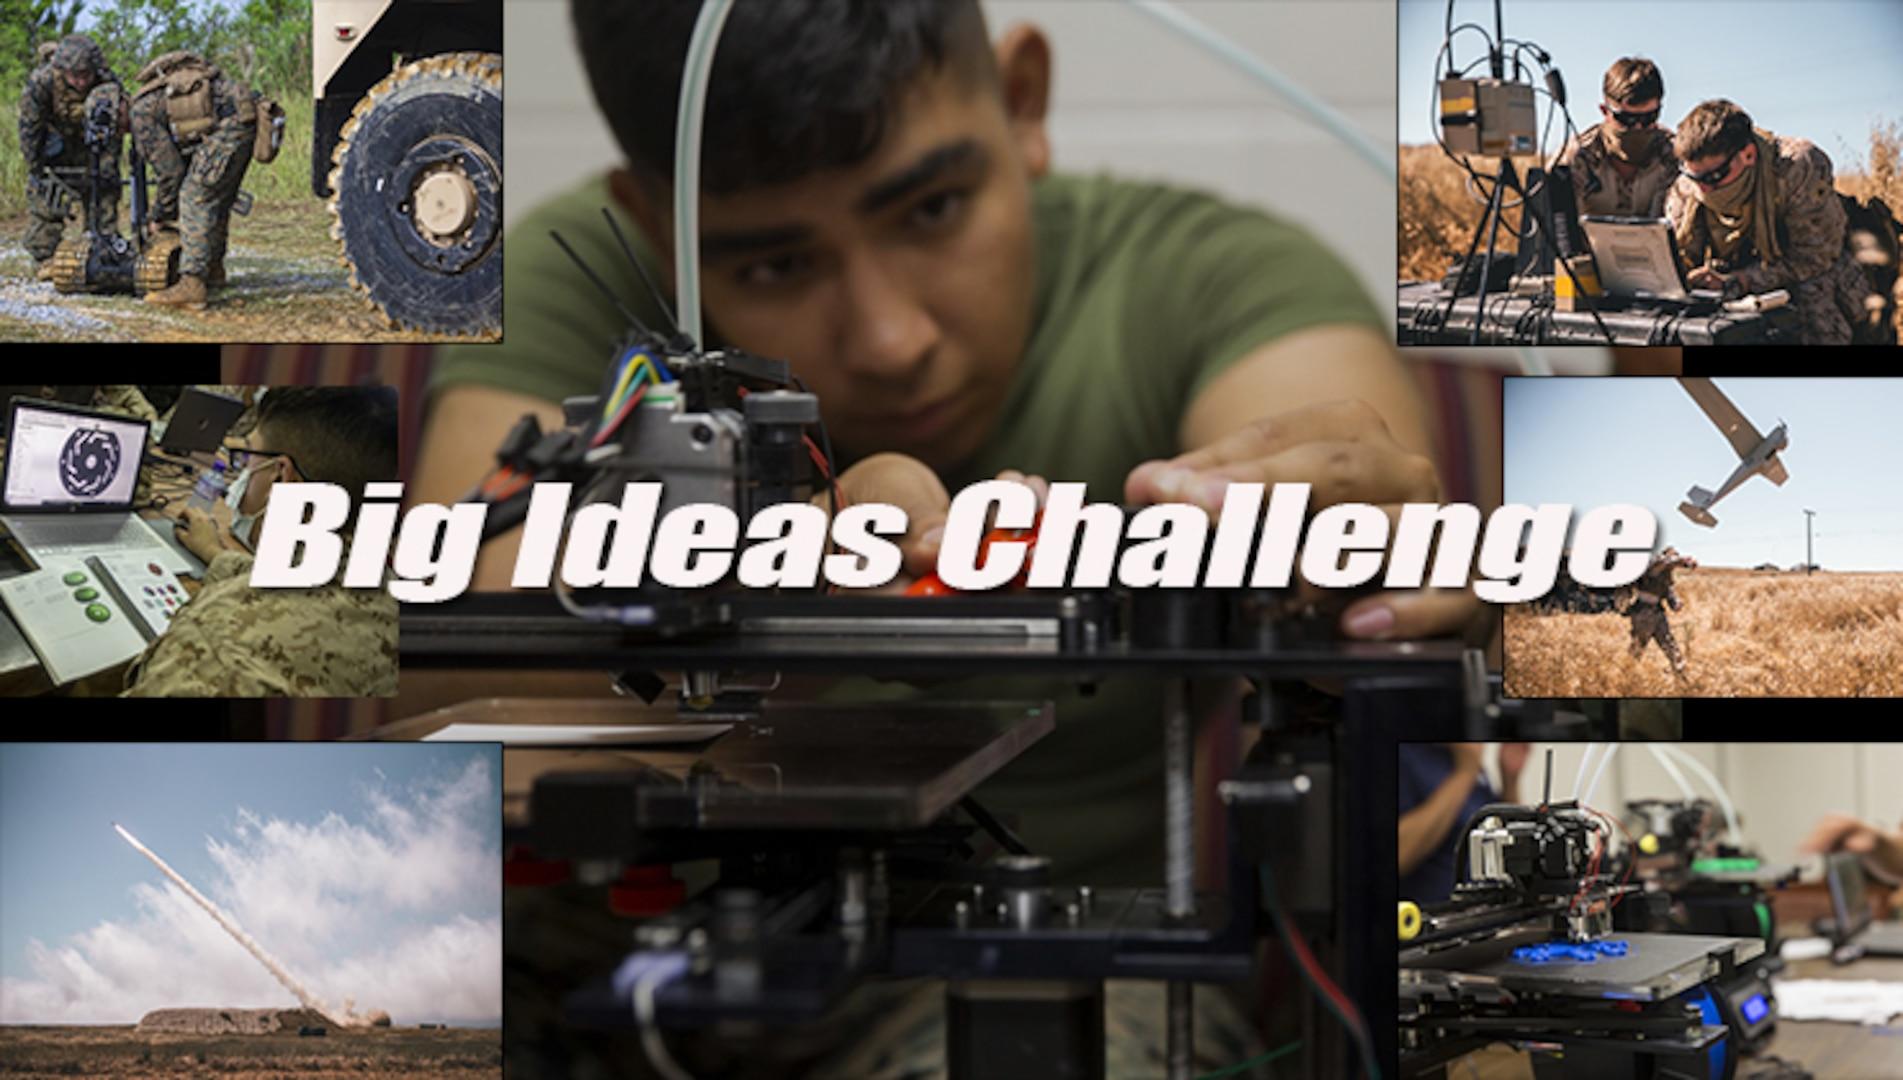 III MEF explores innovative concepts through Big Ideas Challenges